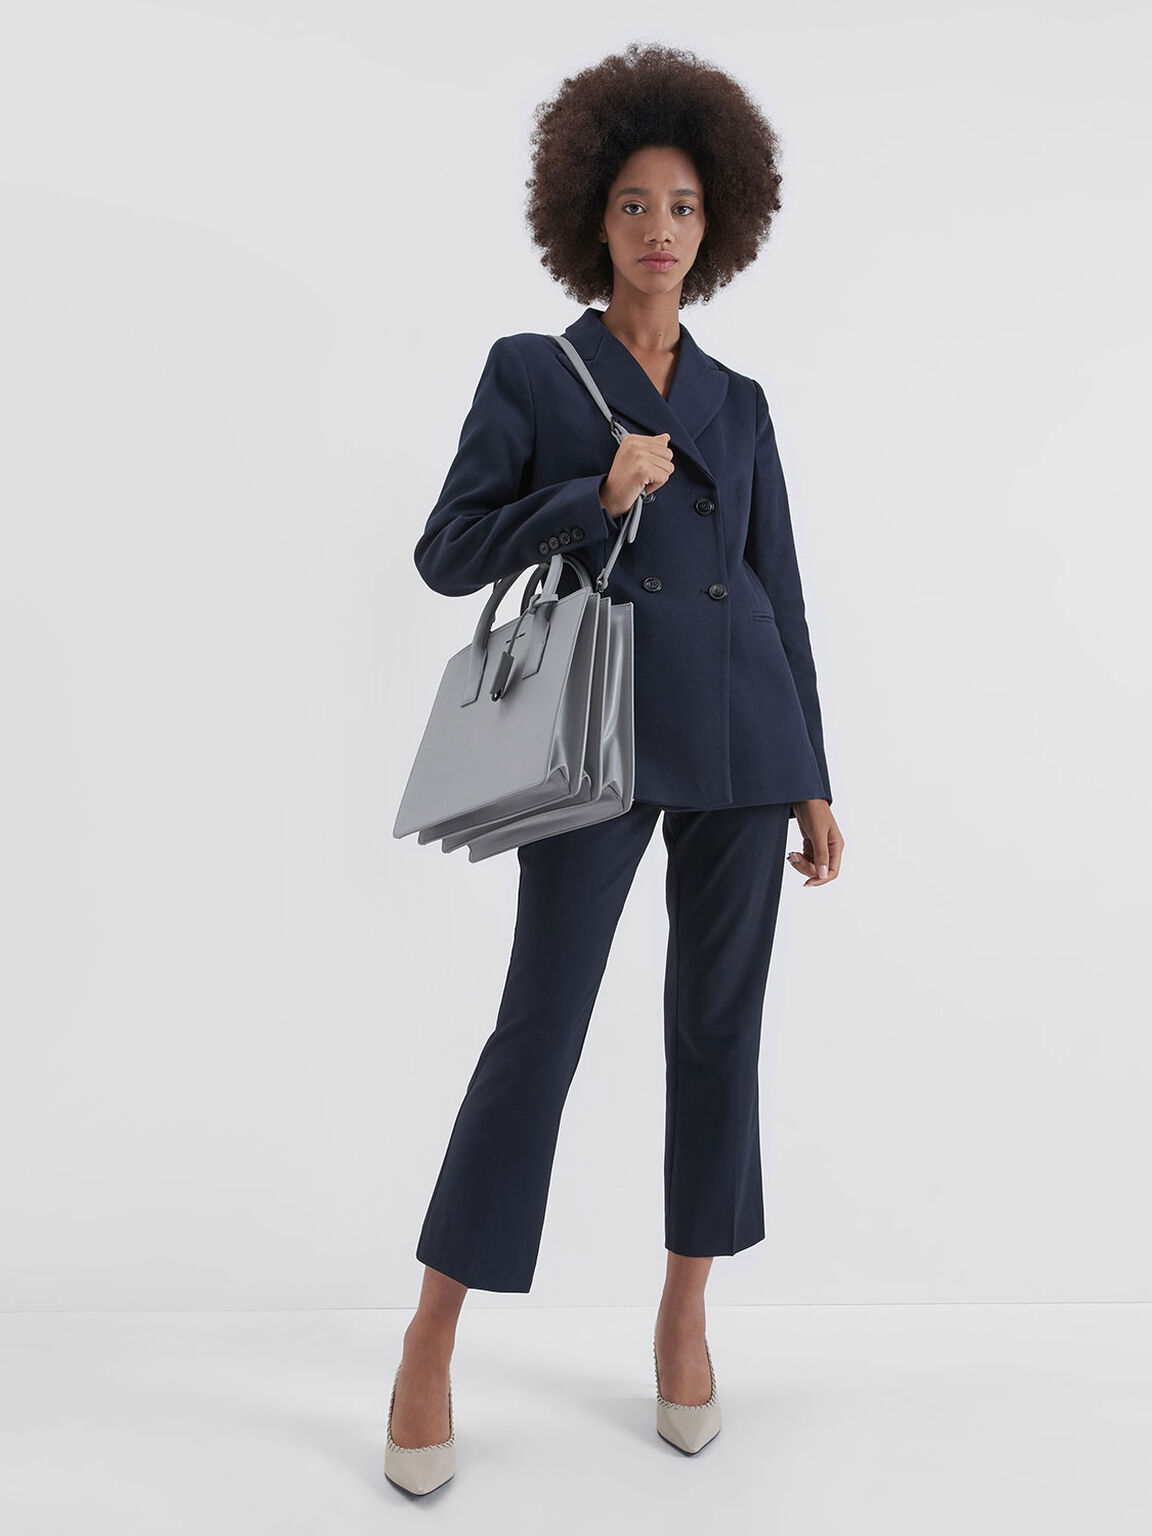 Large Structured Tote Bag, Grey, hi-res